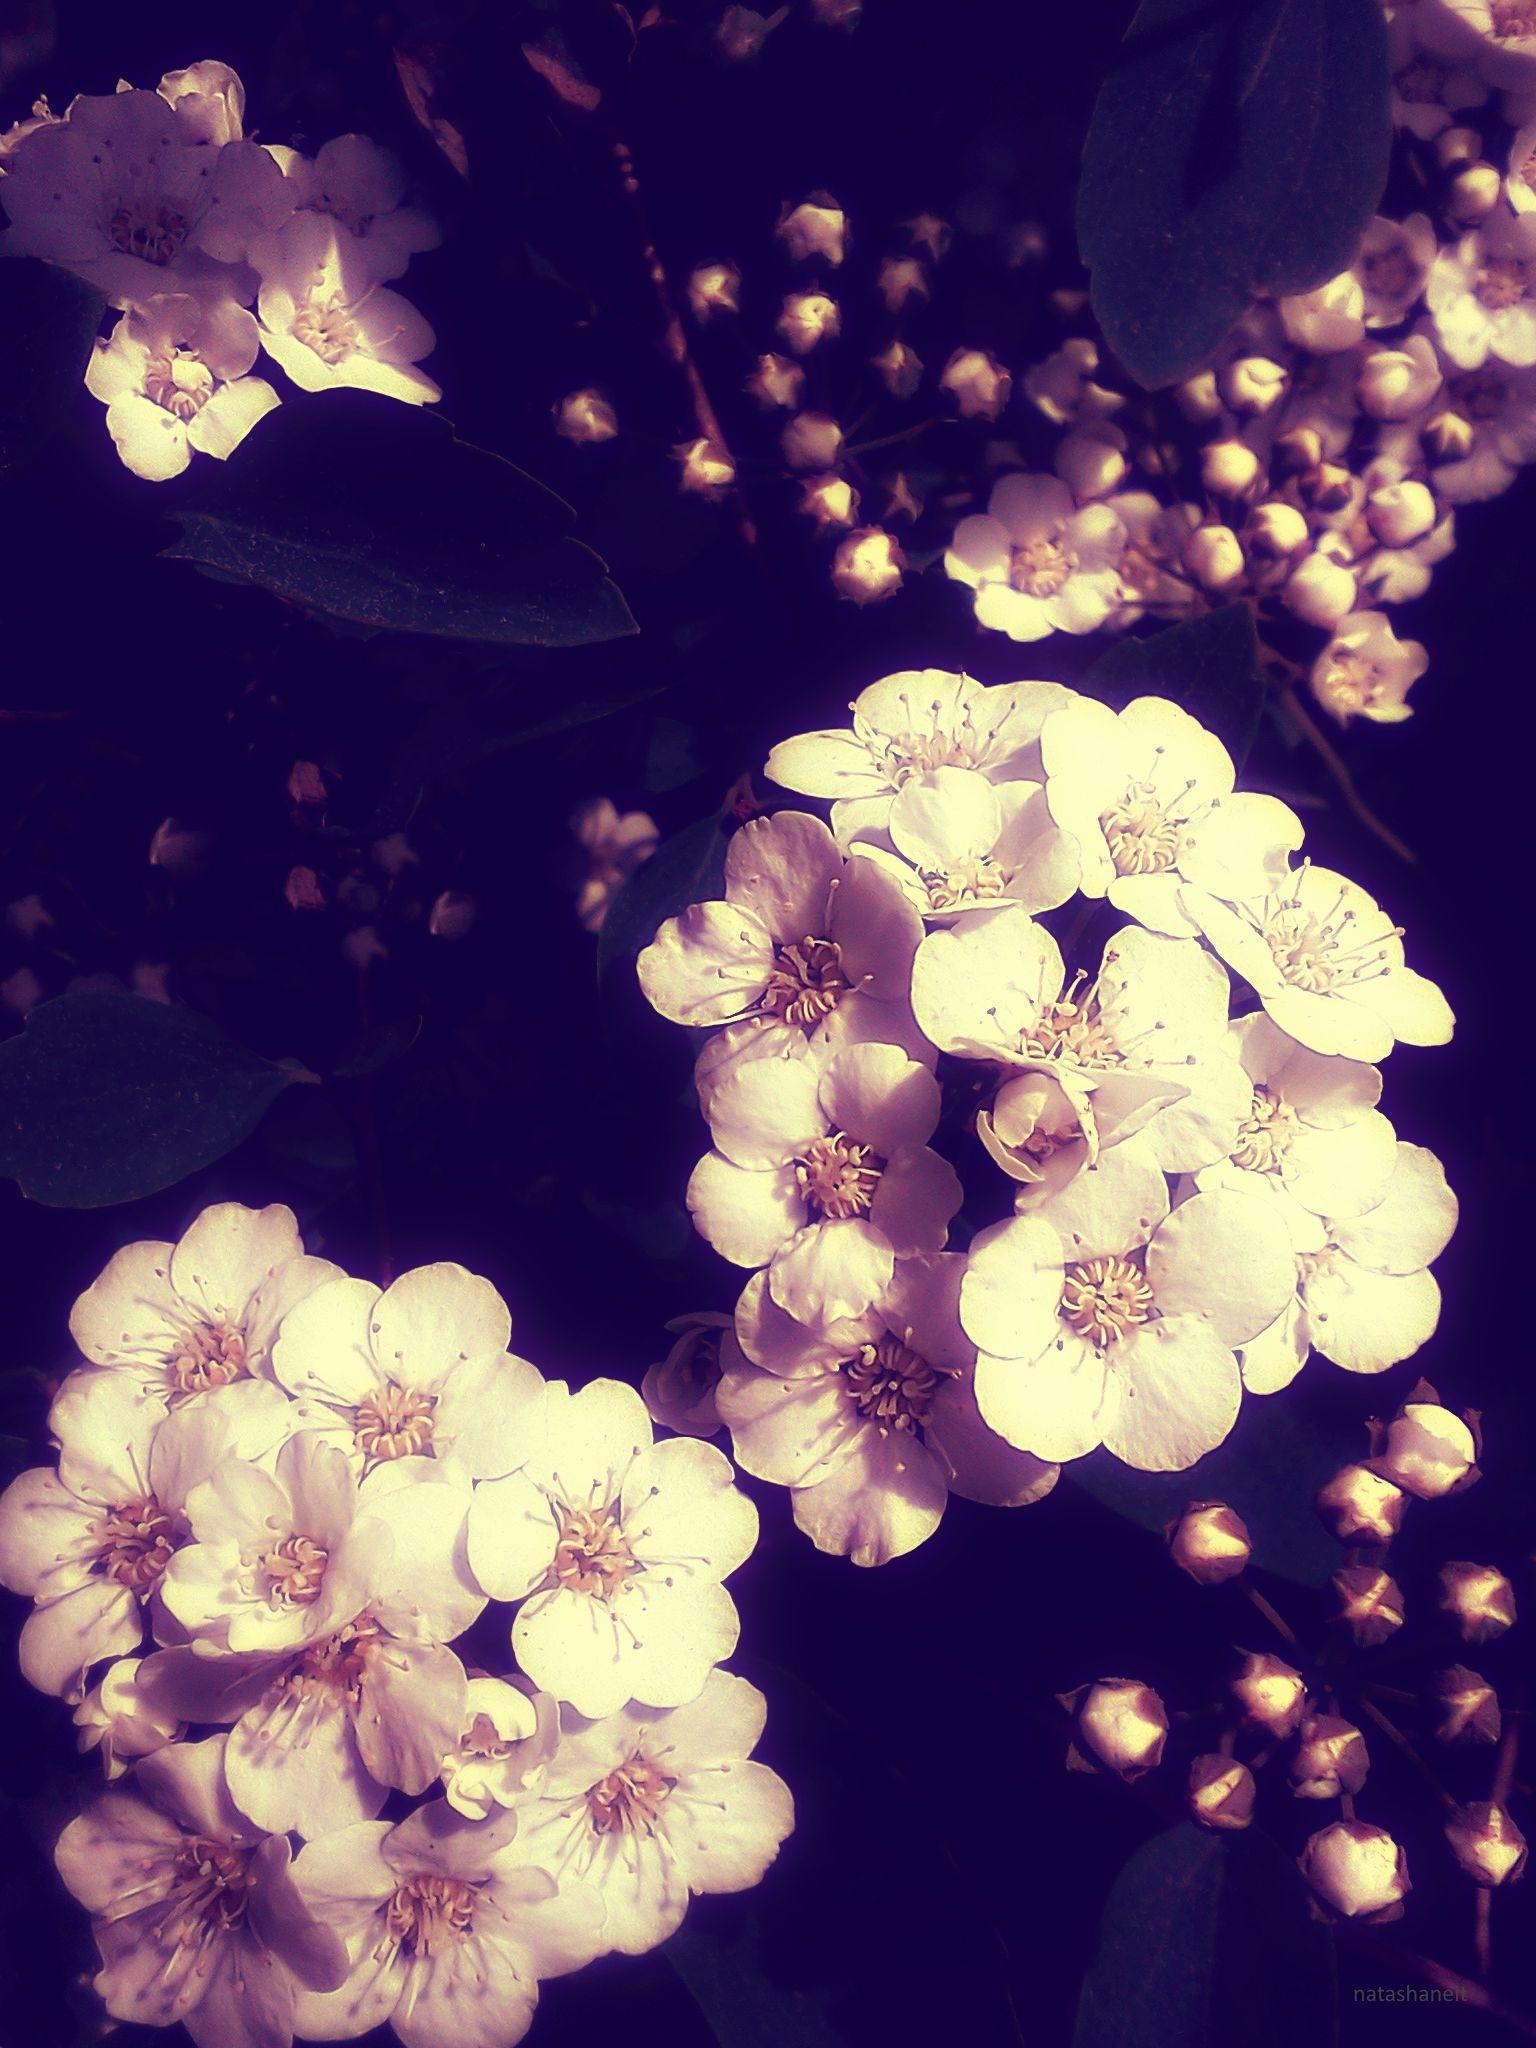 Spring bloom by natashaneit